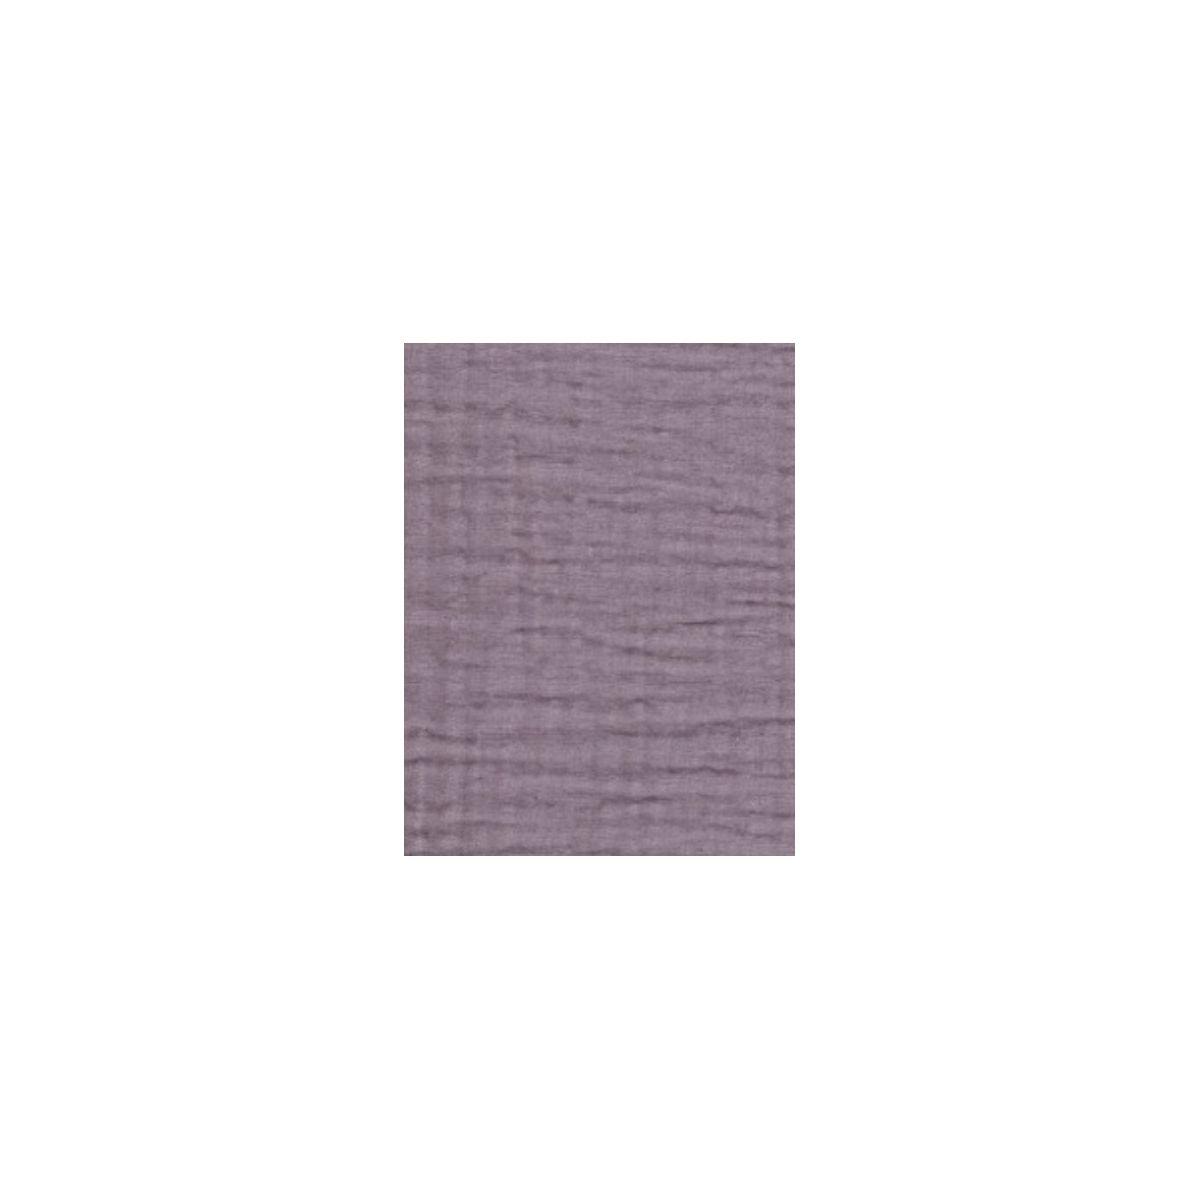 Koc Summer Blanket dusty lilac zgaszony fiolet - Numero 74